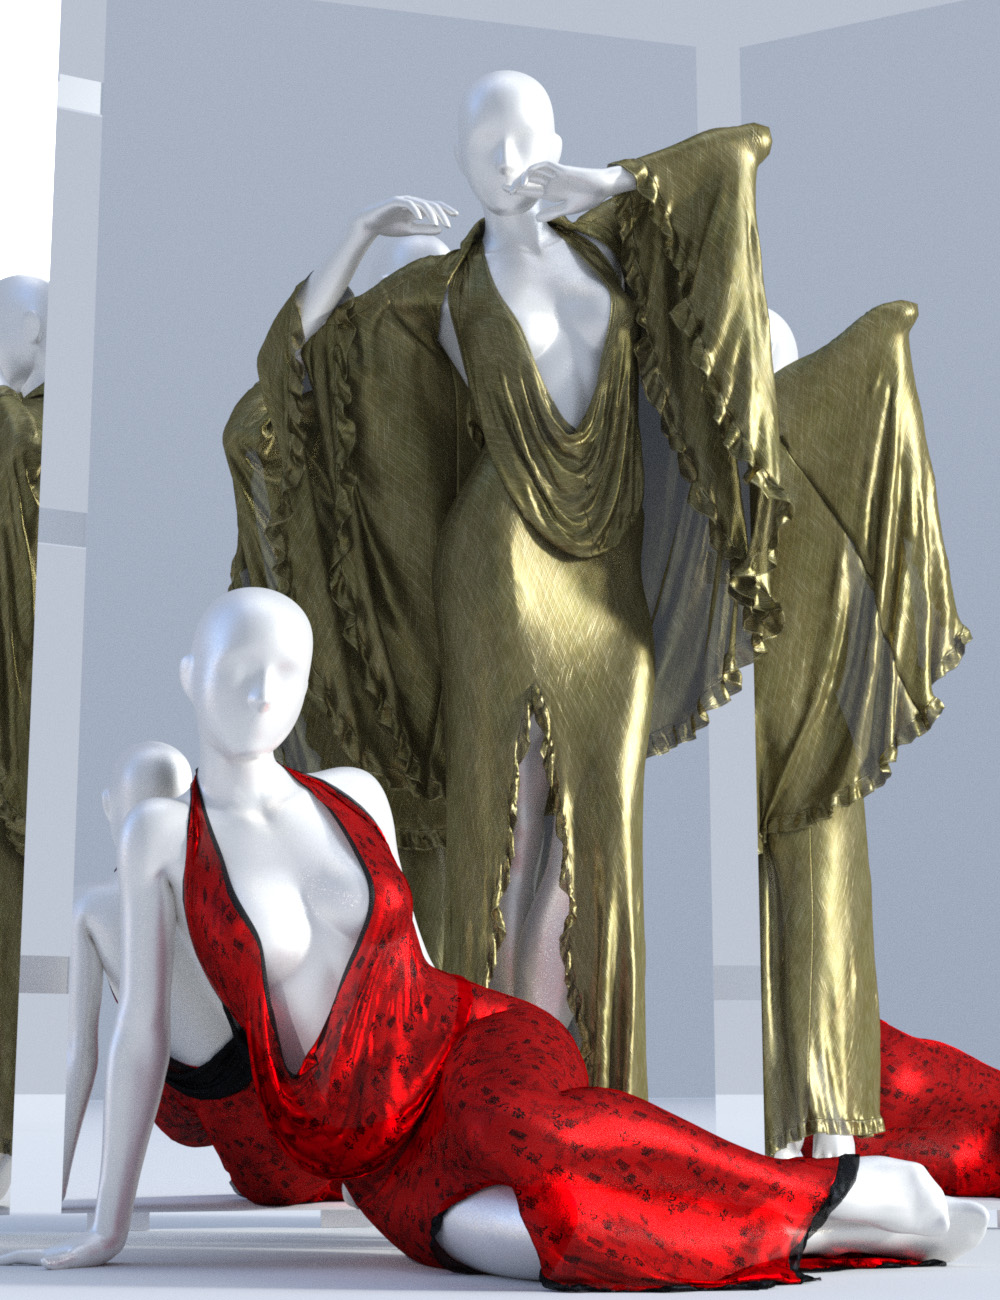 dForce Femme Fatale Dress for Genesis 3 and 8 Female(s) by: Sshodan, 3D Models by Daz 3D